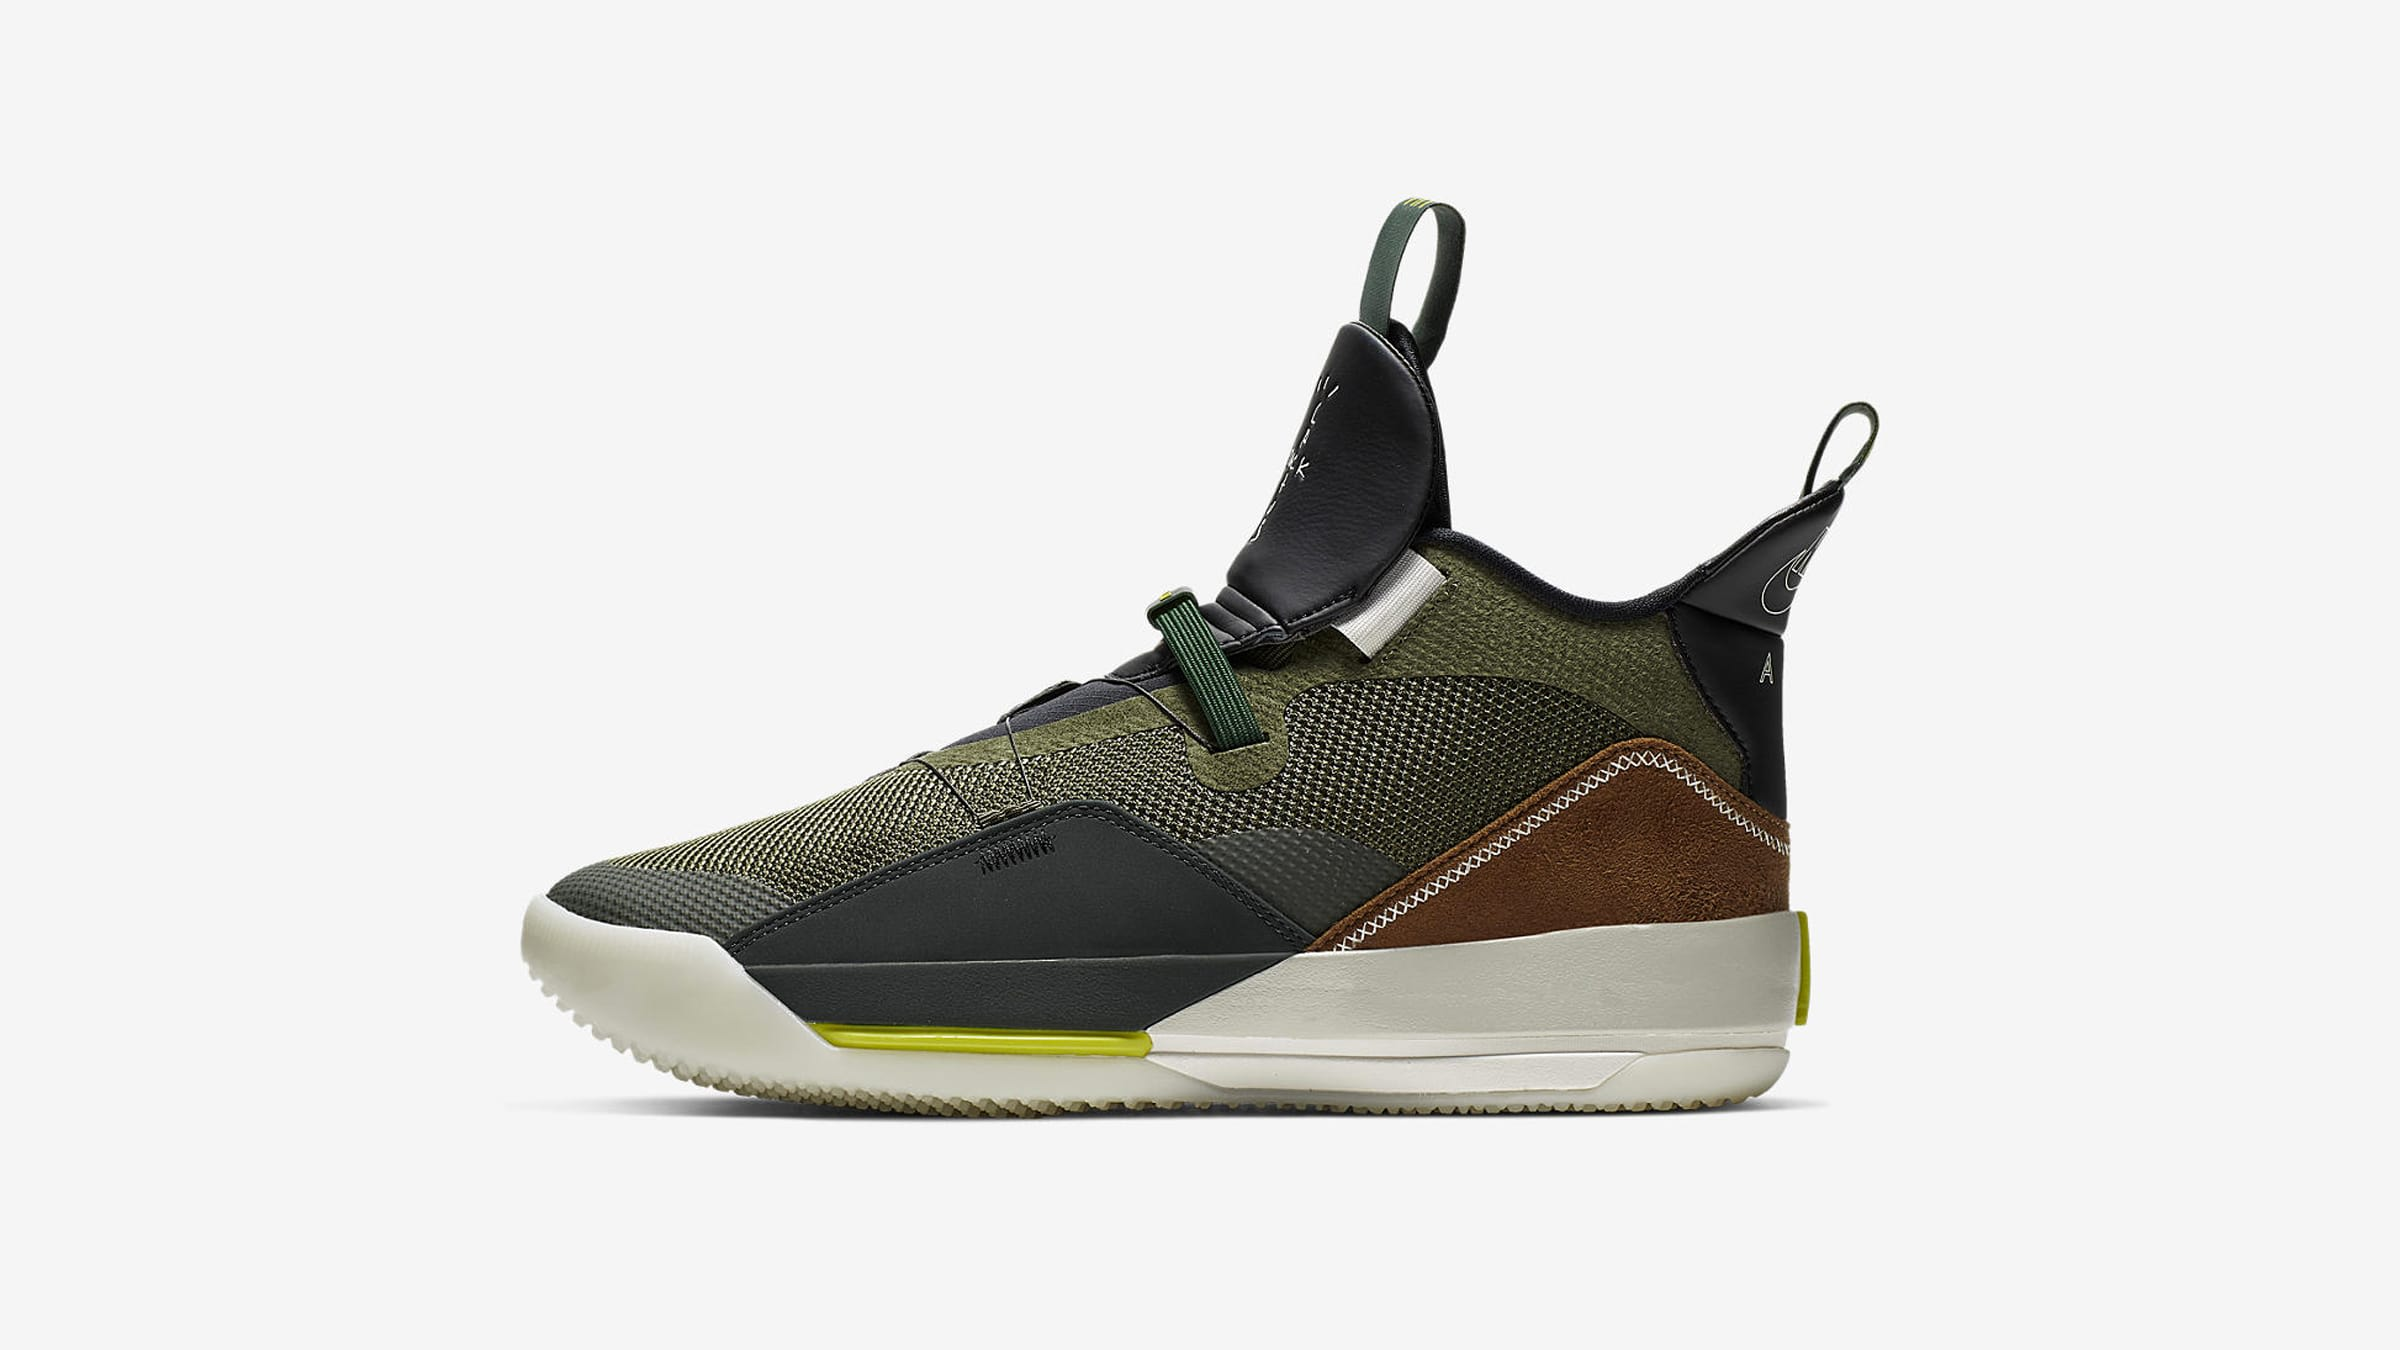 01020ebac45 END. Features | Travis Scott x Nike Air Jordan XXXIII - Register Now ...